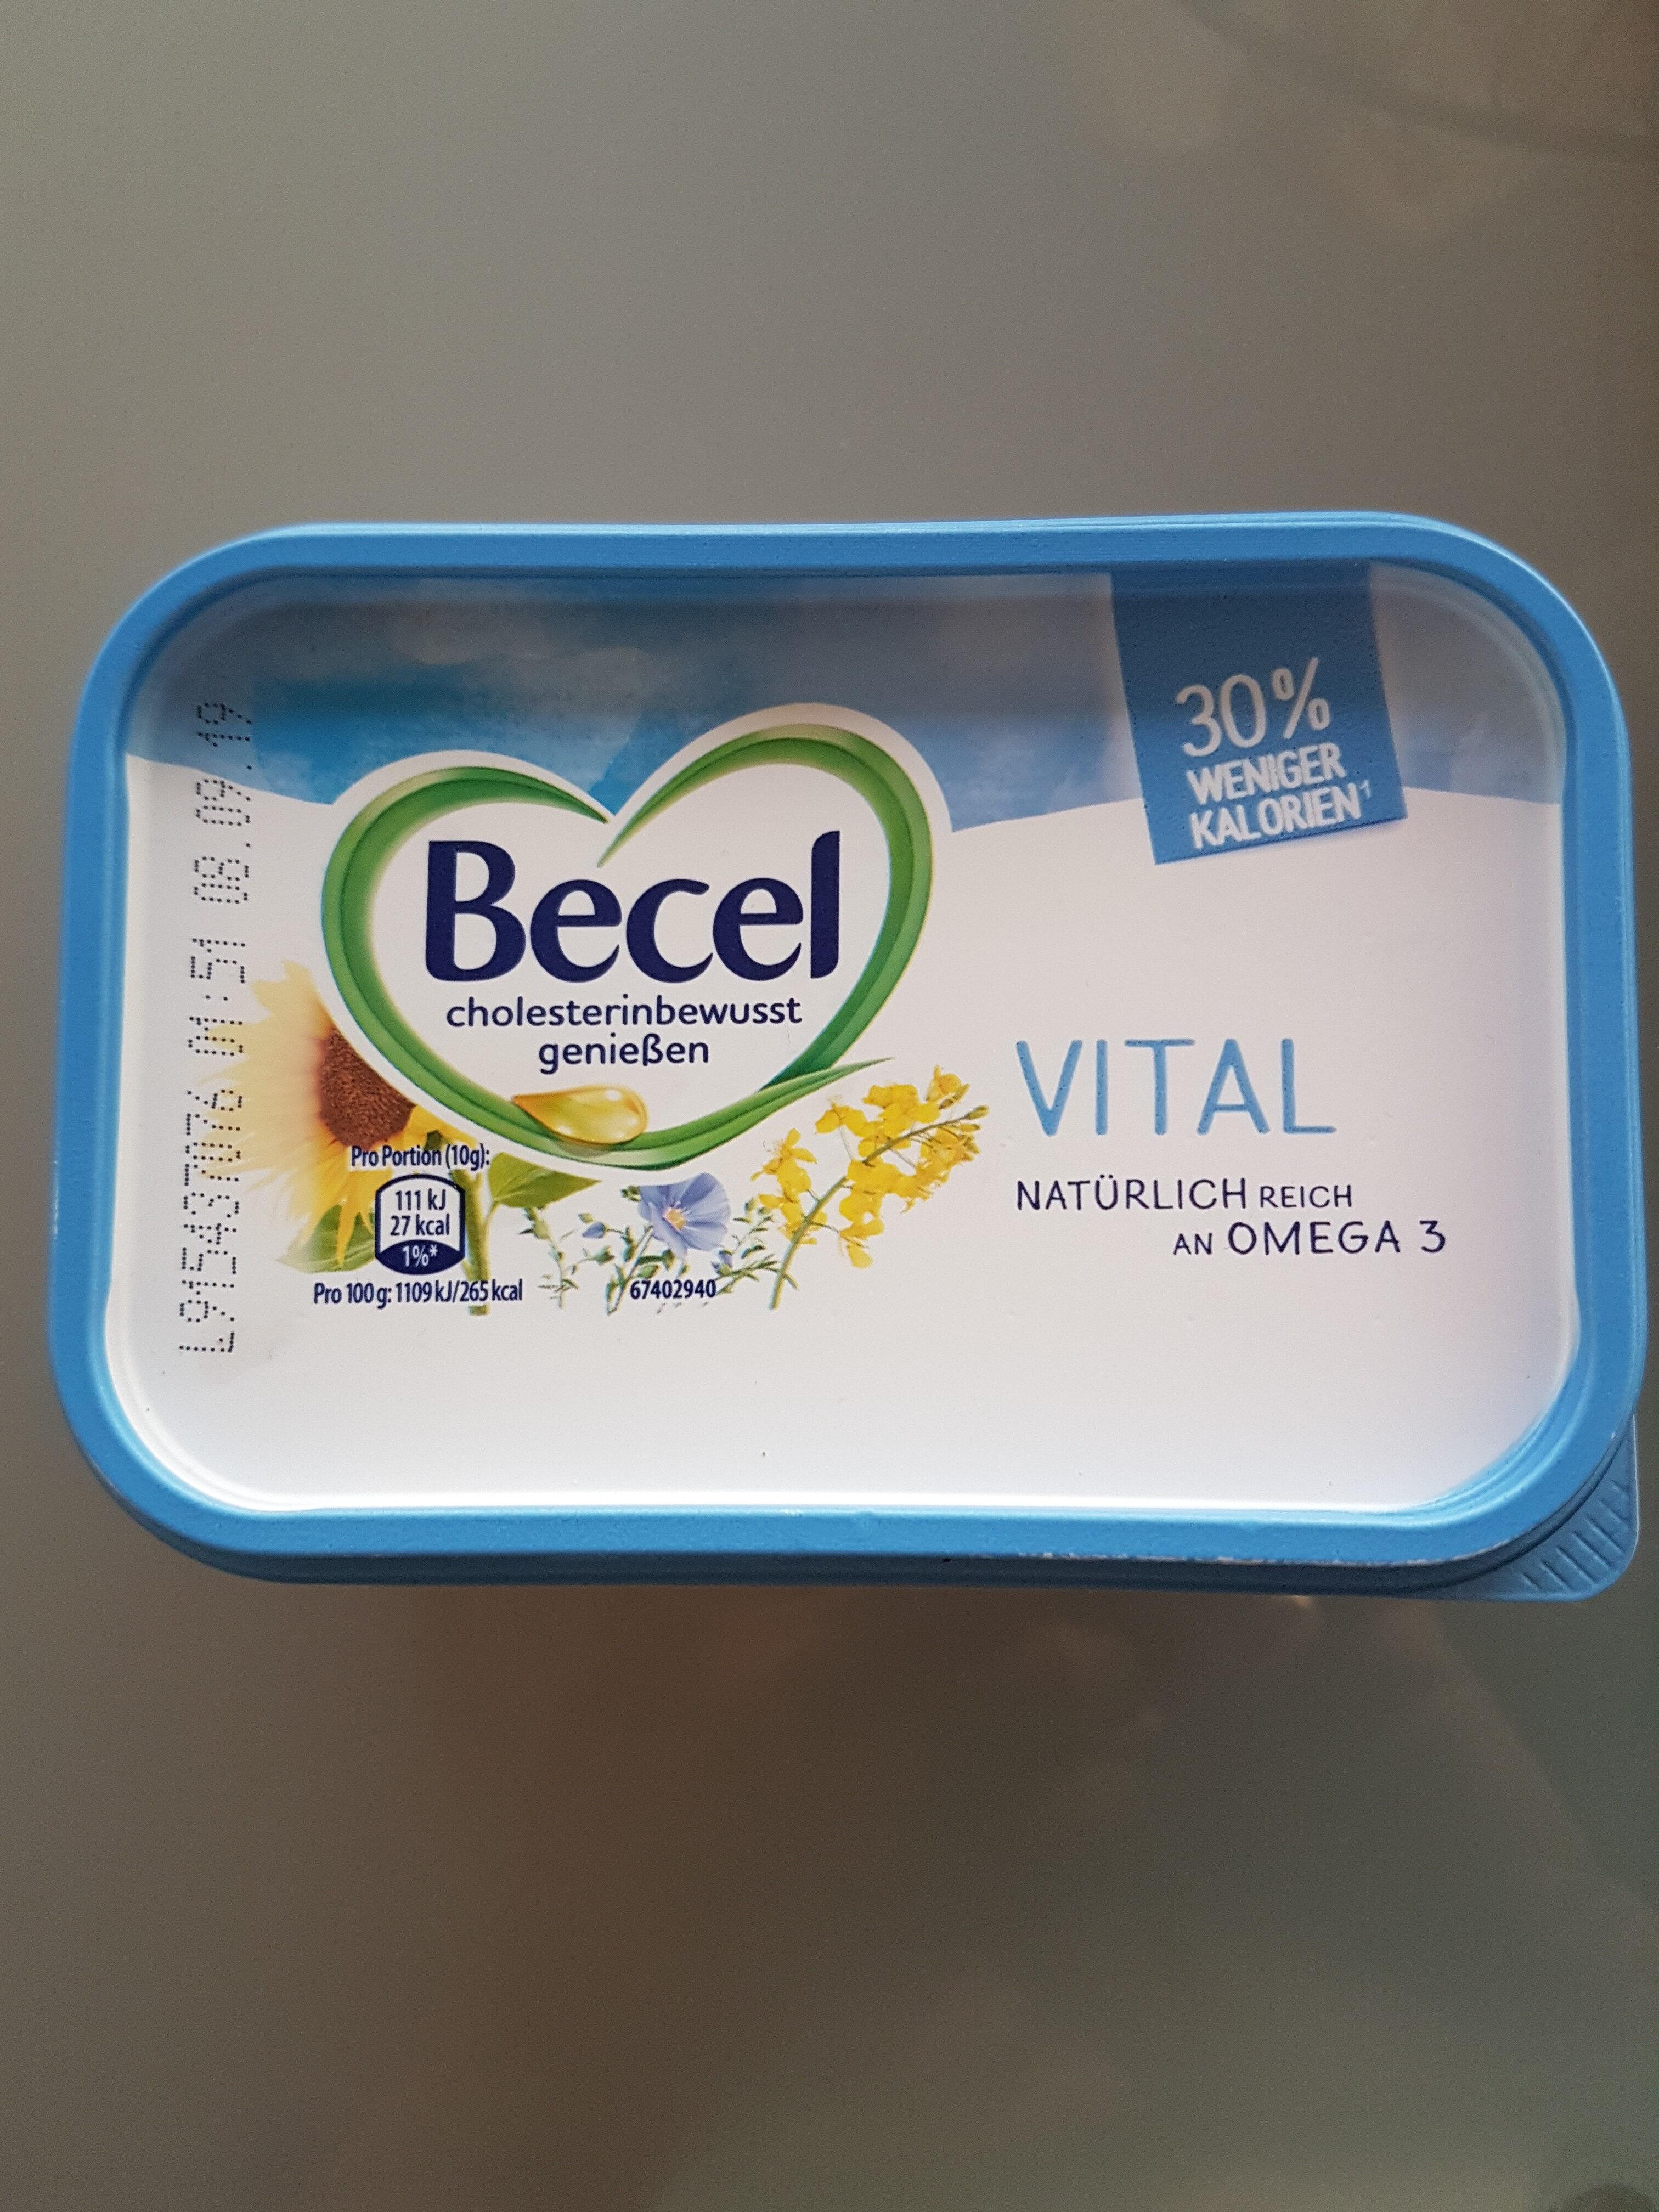 Becel Vital - Product